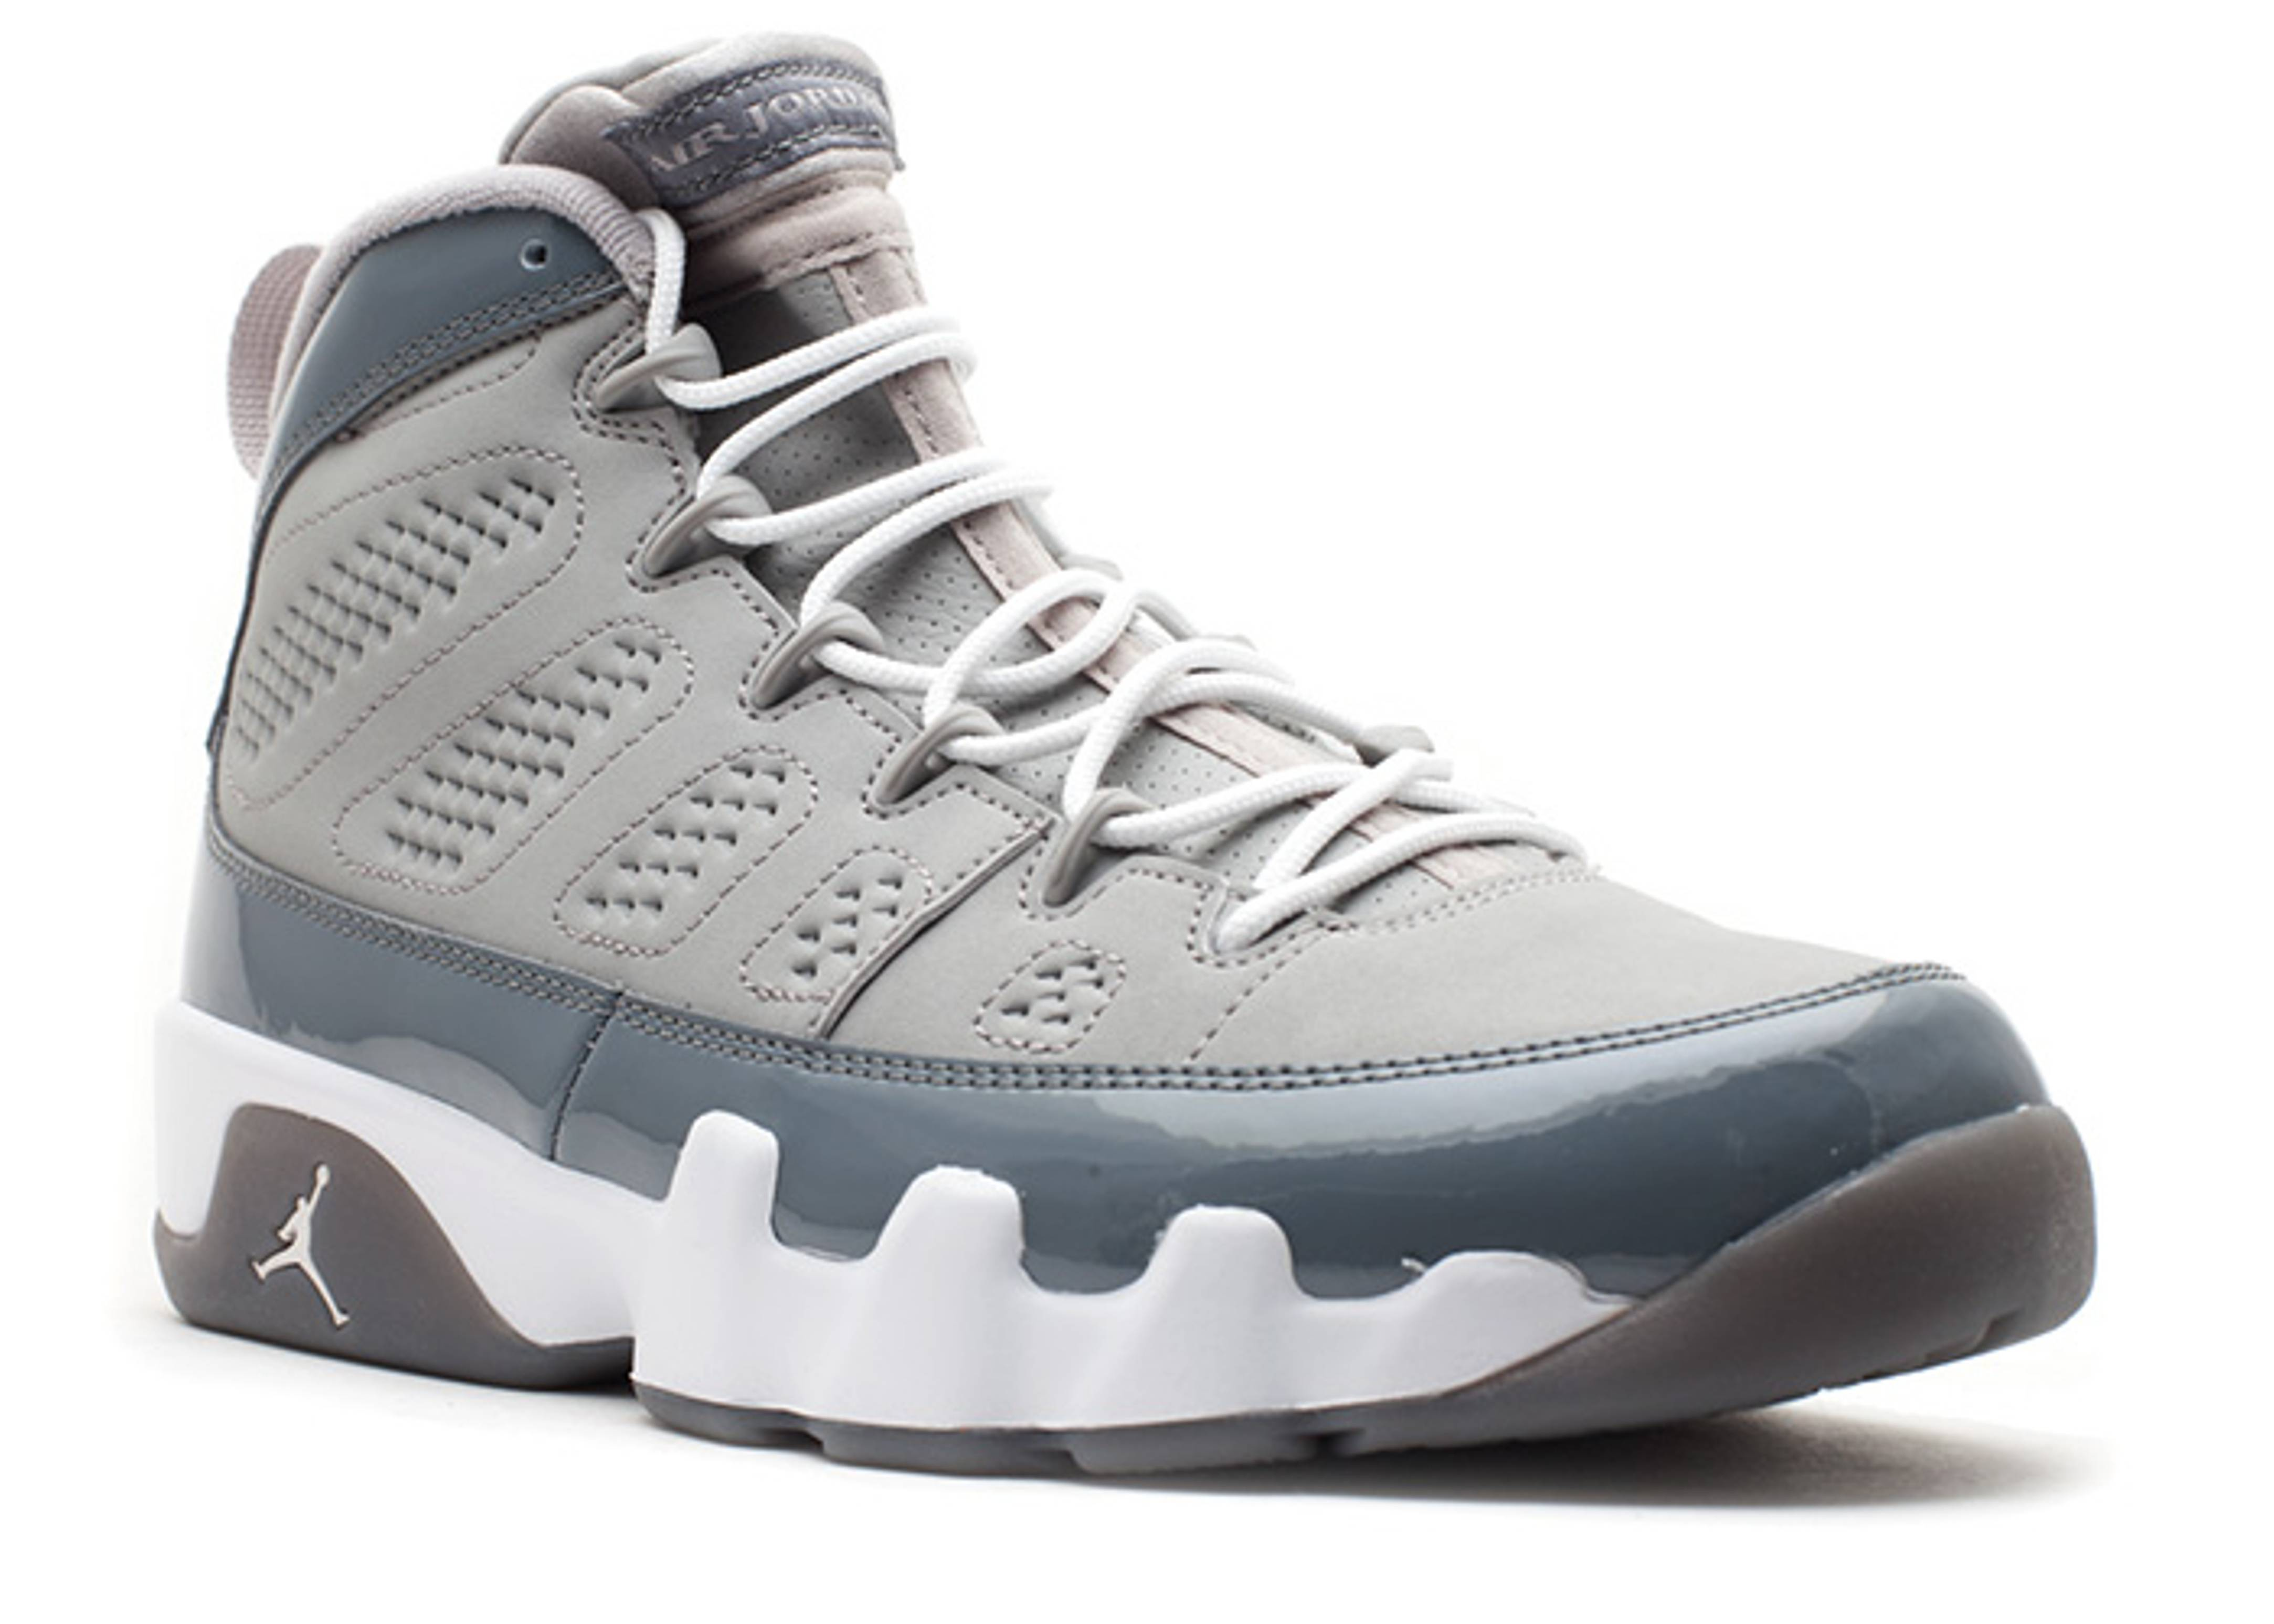 Jordan 9 Grey